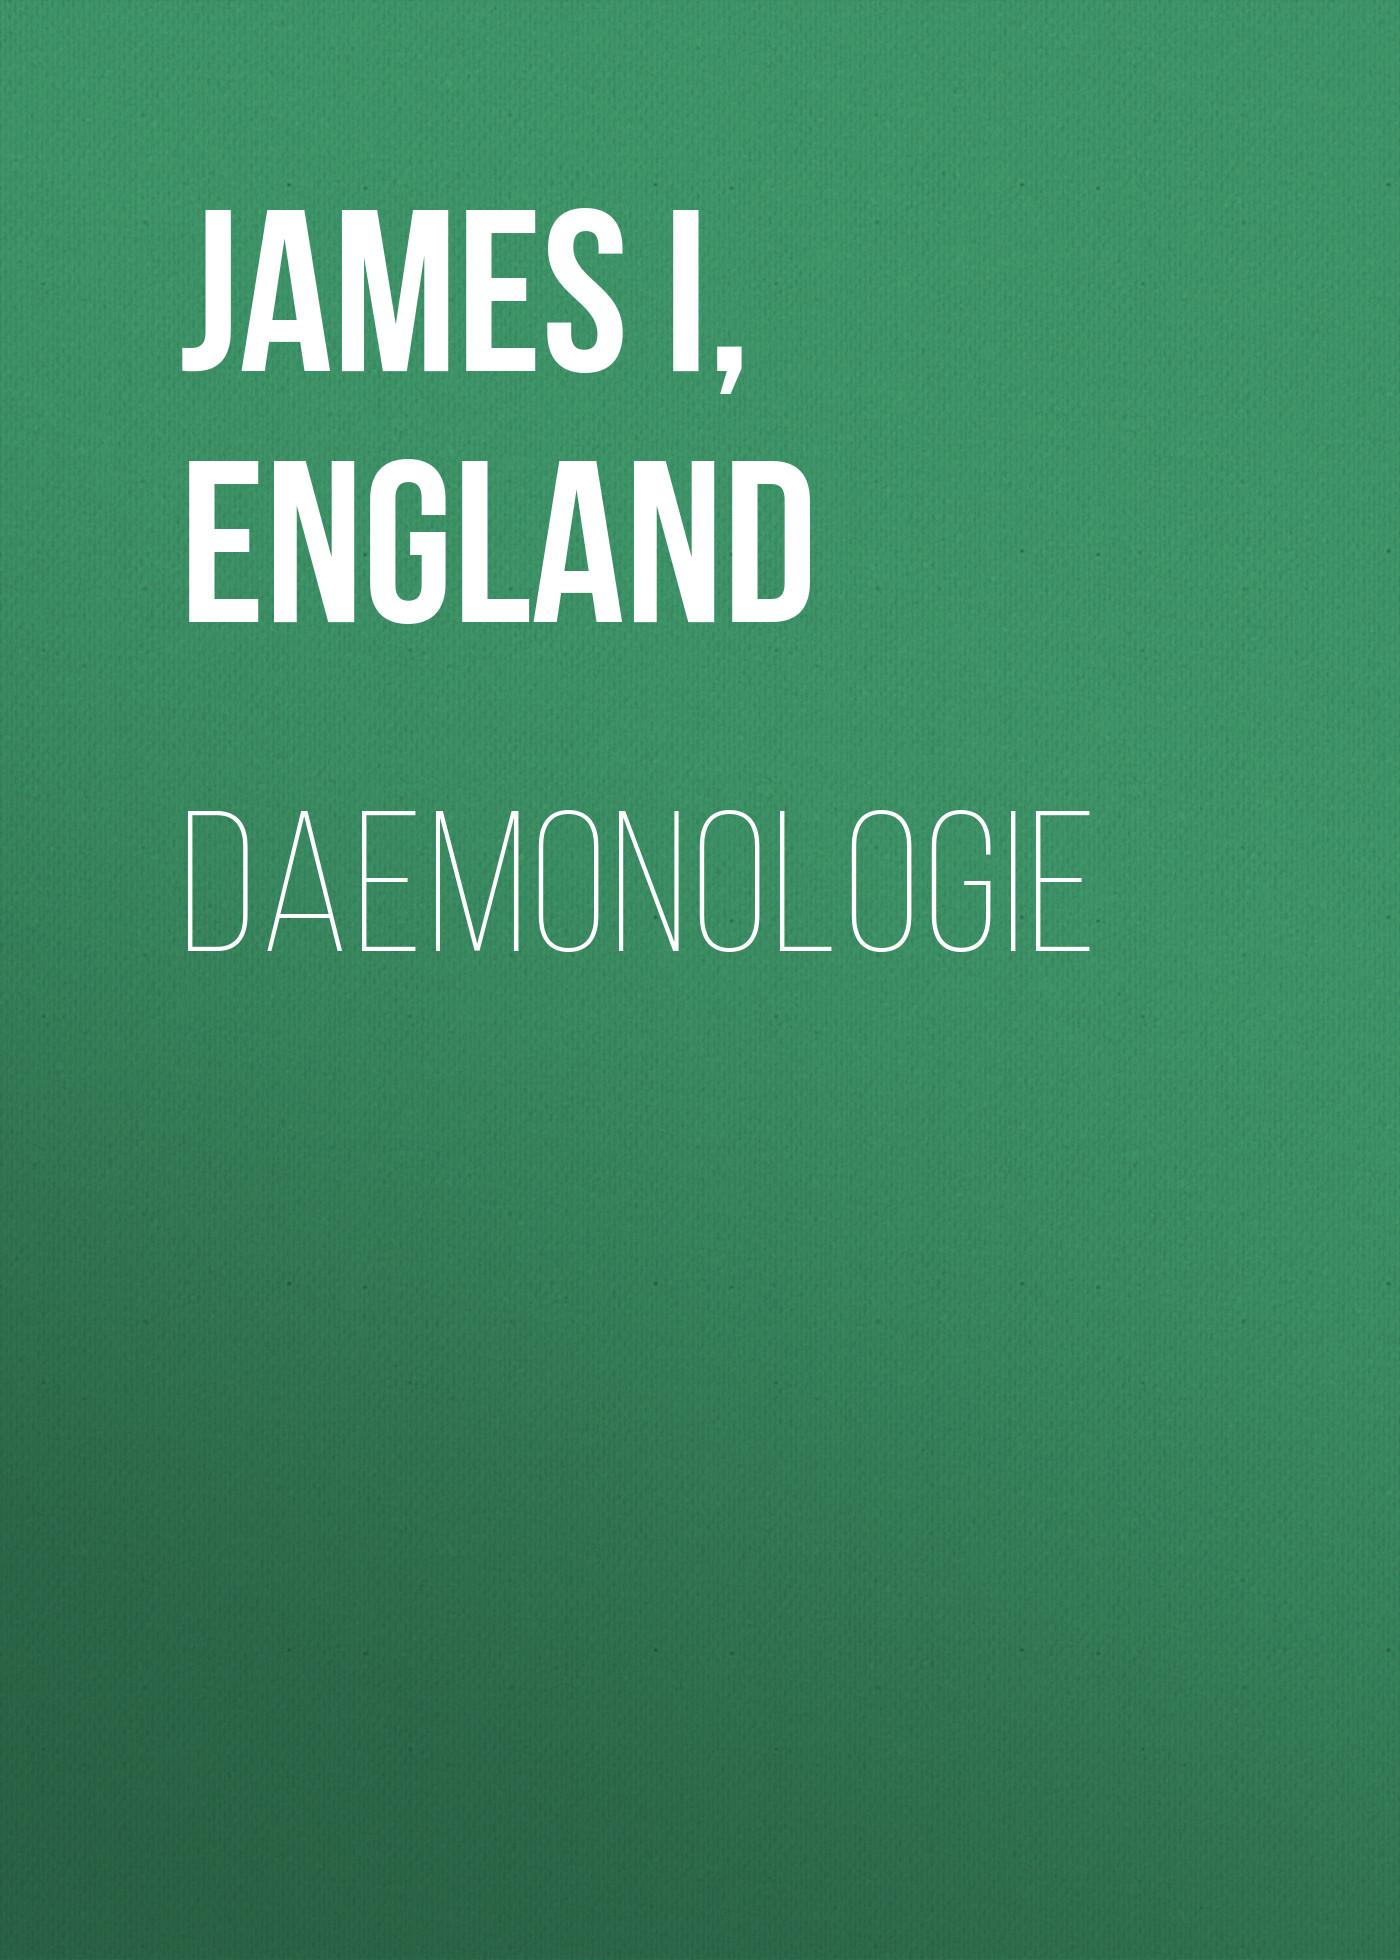 James I, King of England Daemonologie ellis james tandy shawn of skarrow